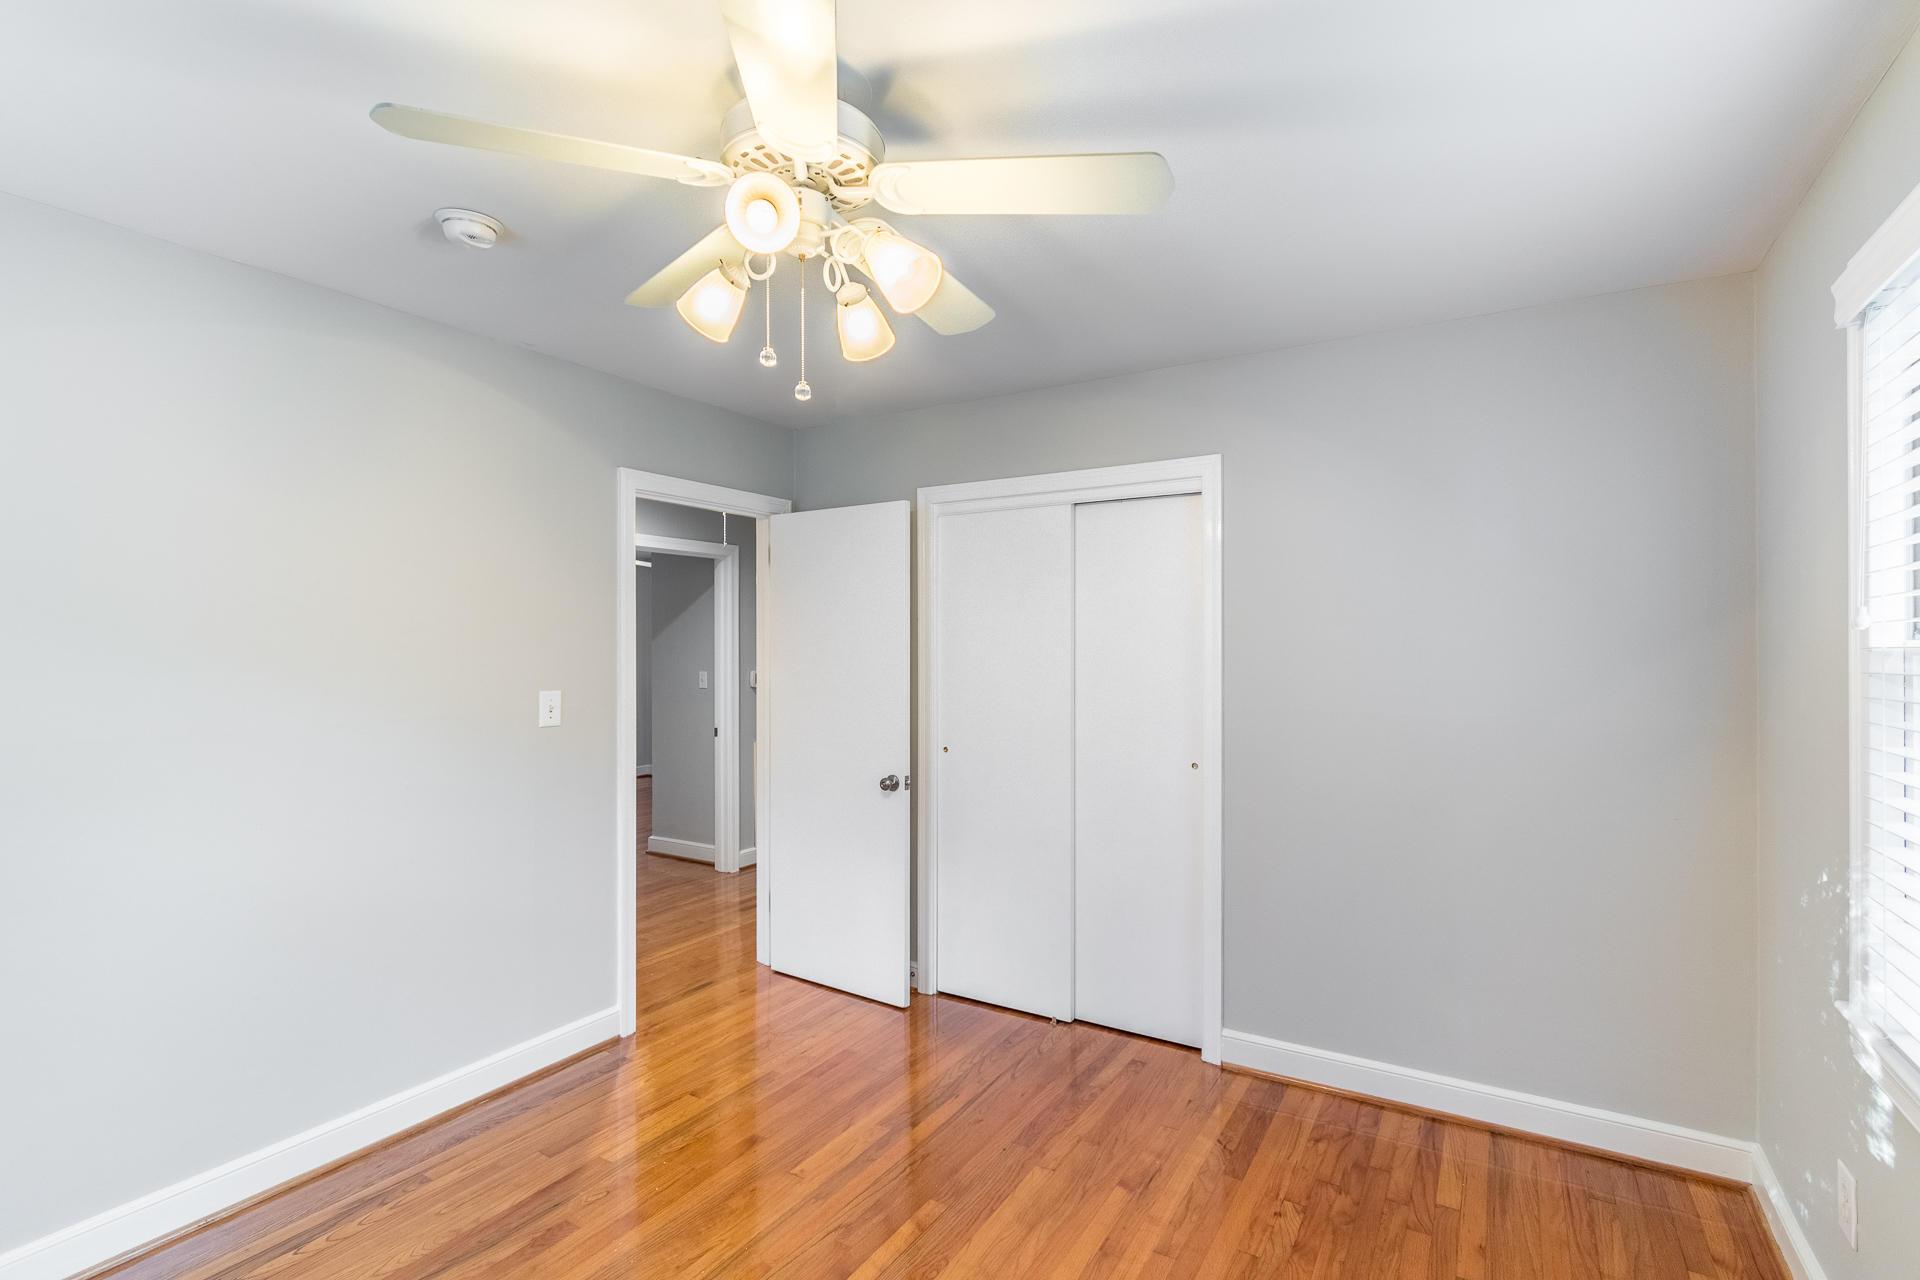 Edgewood Gardens Homes For Sale - 507 Risher, Charleston, SC - 24